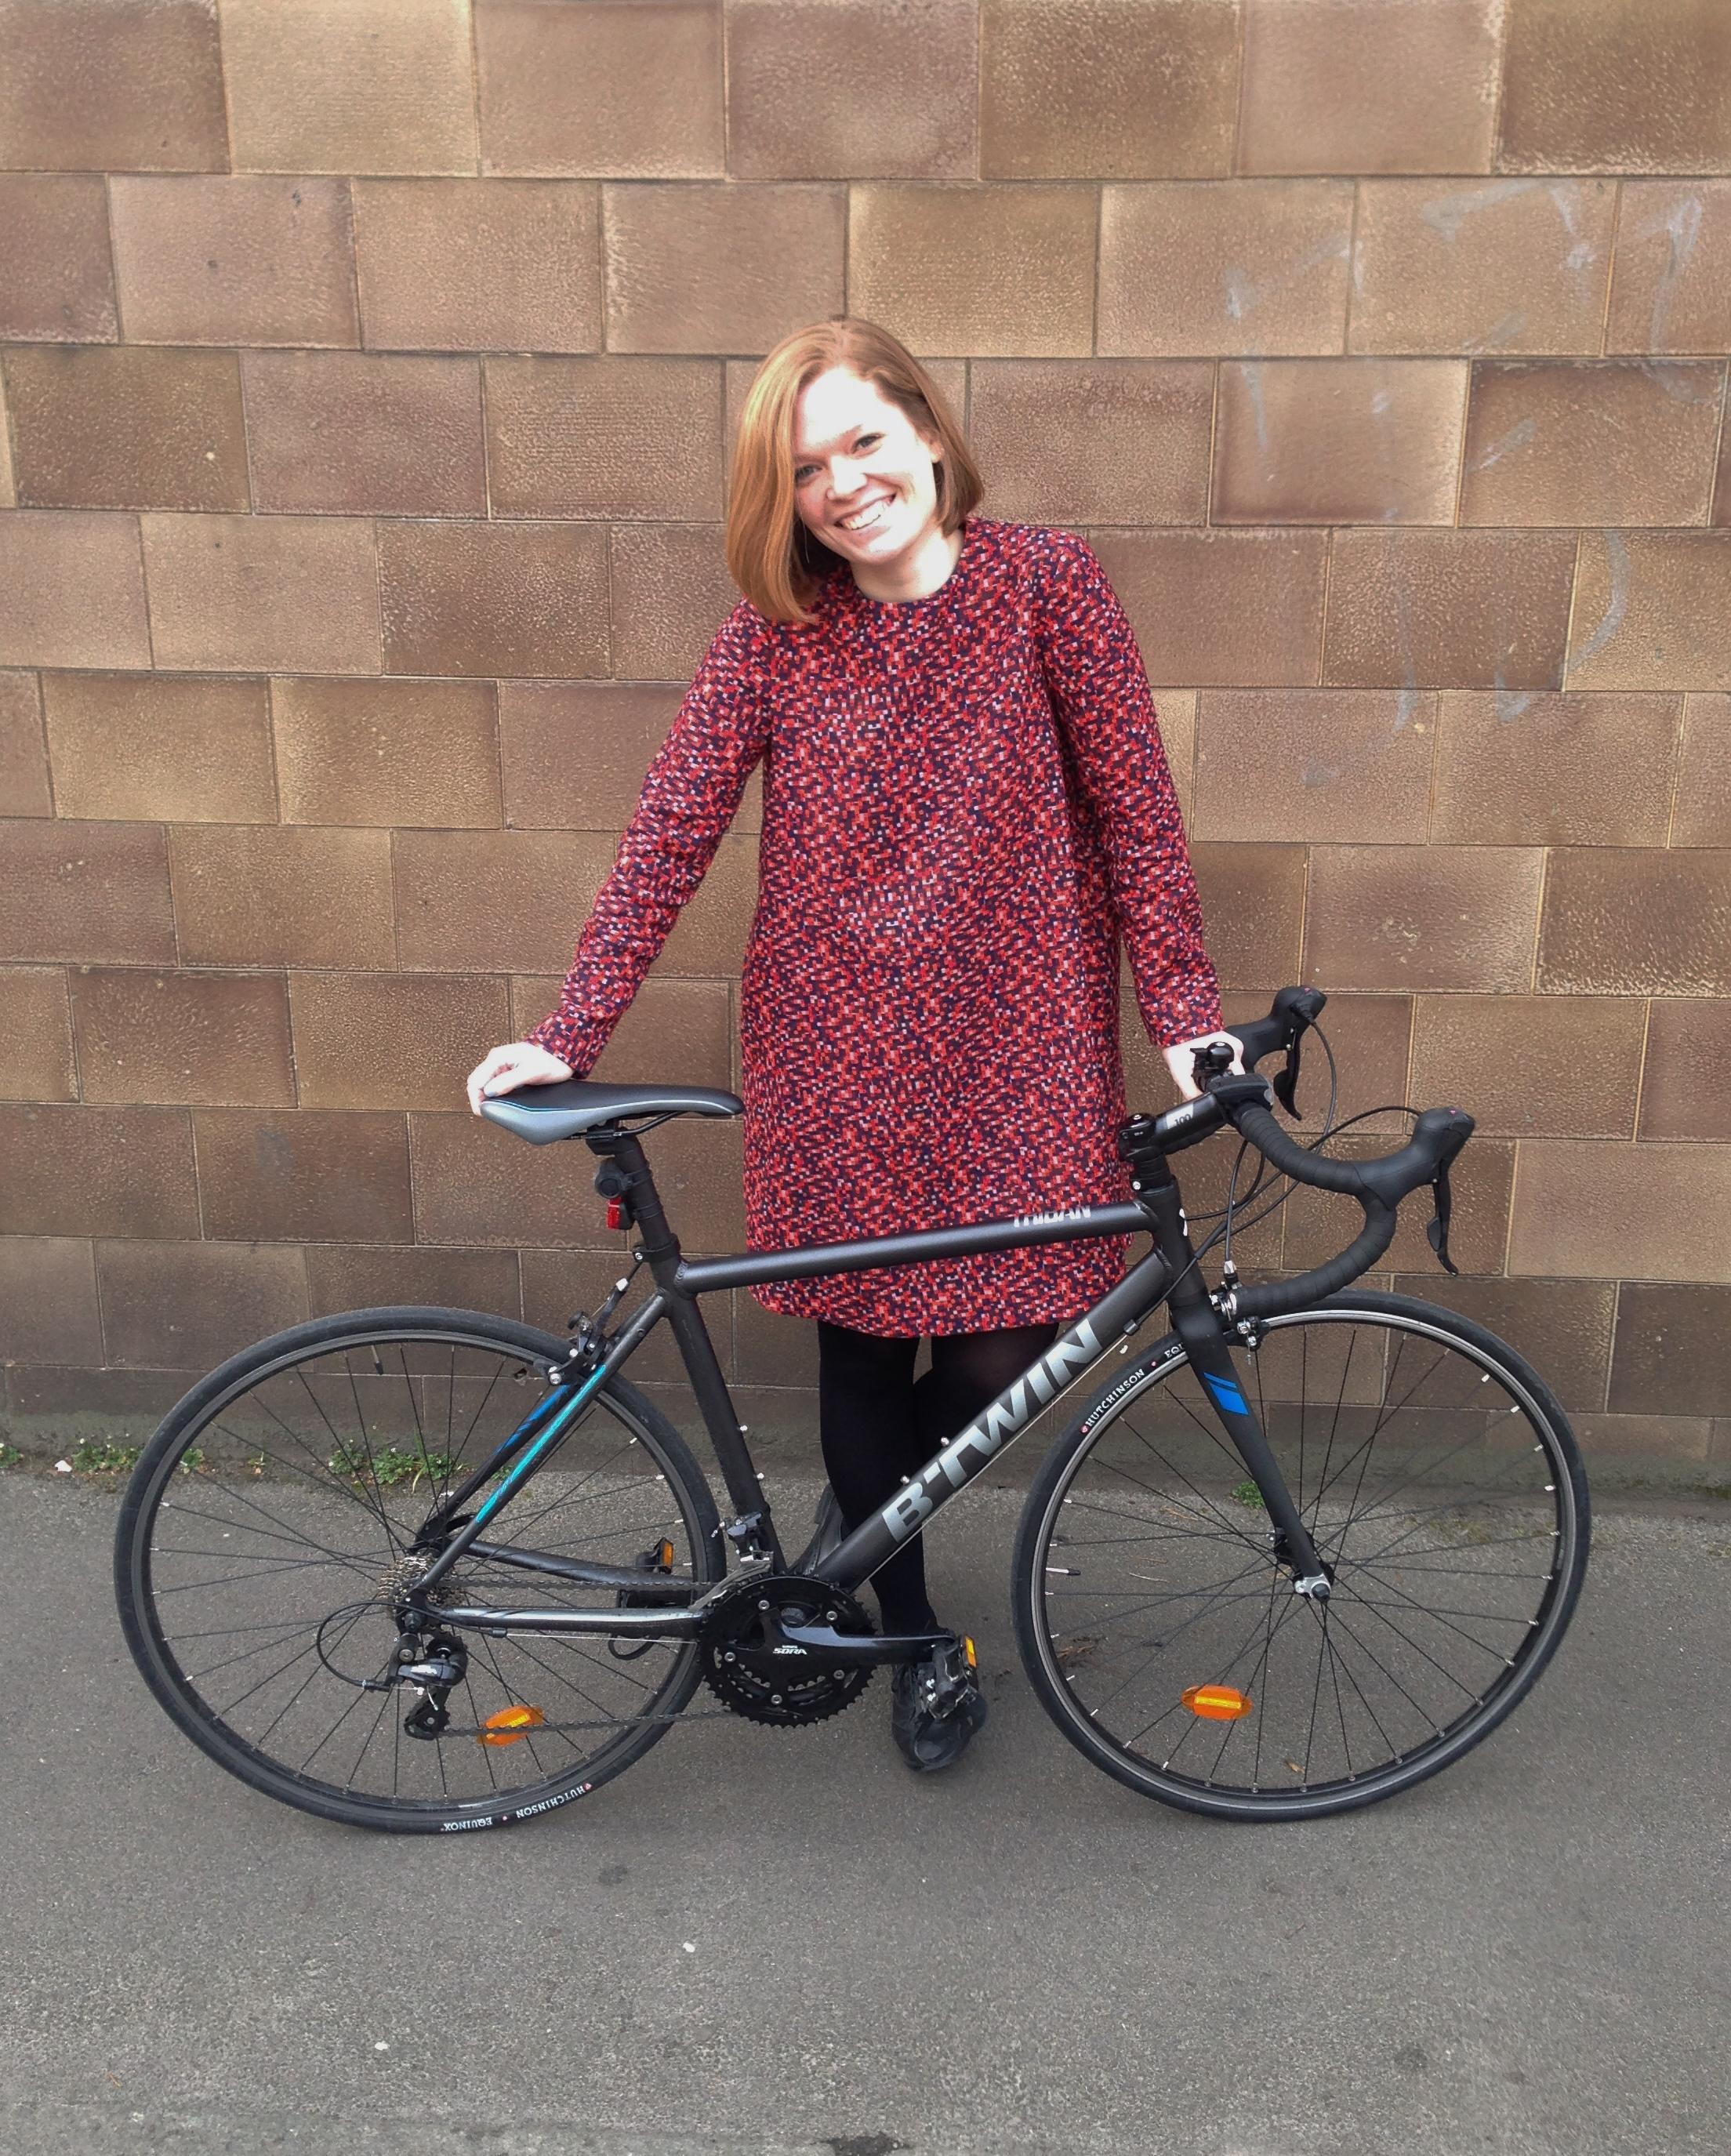 Ellie with her bike